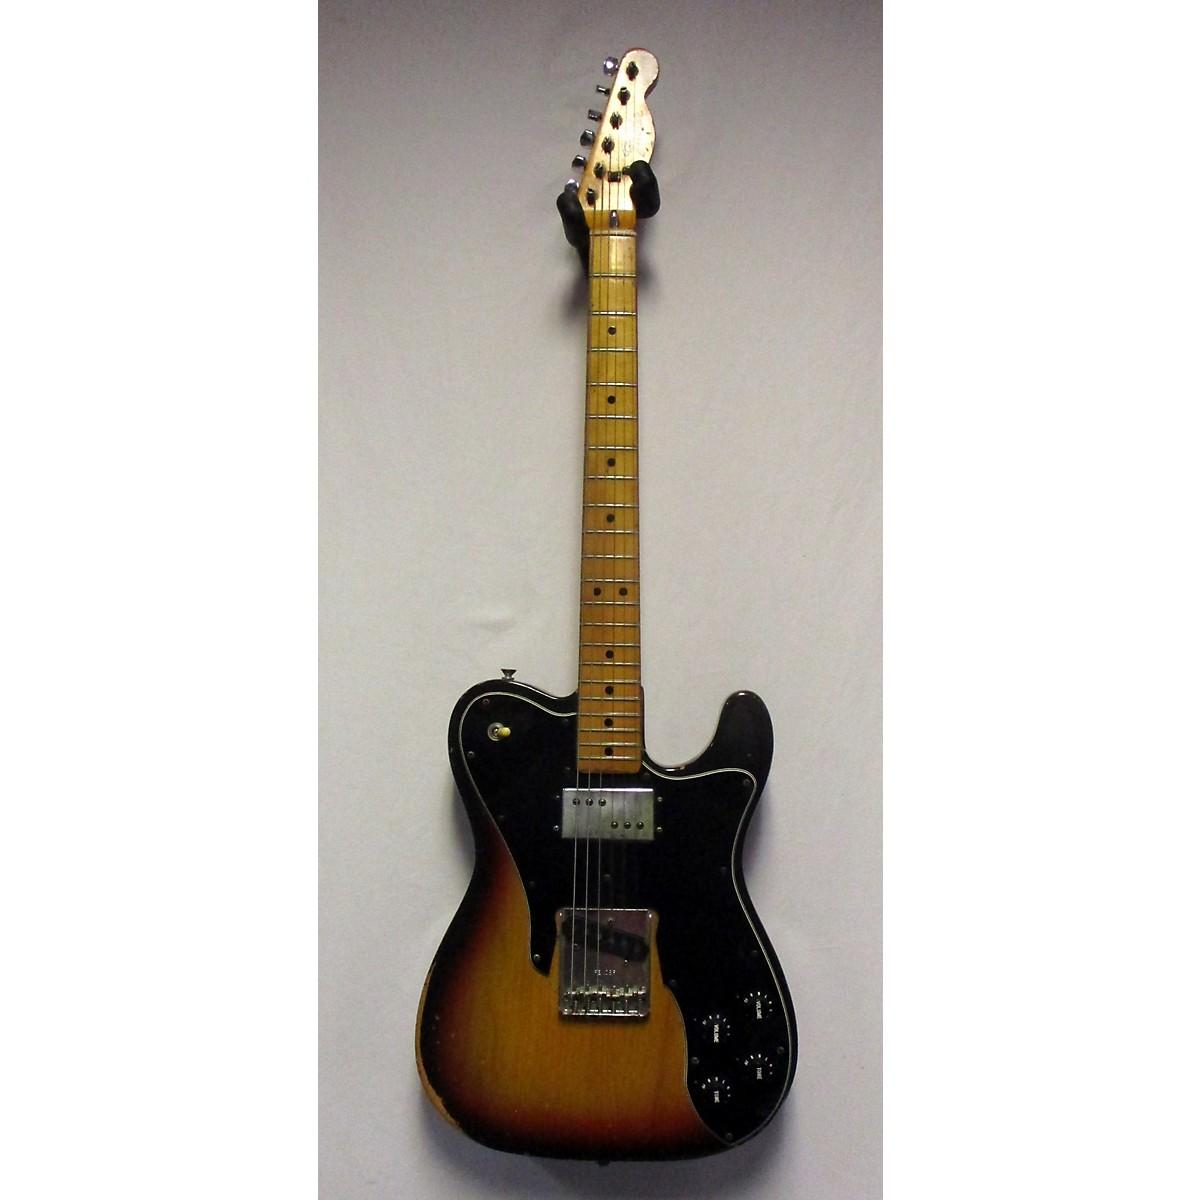 Fender 1976 Telecaster Custom Solid Body Electric Guitar